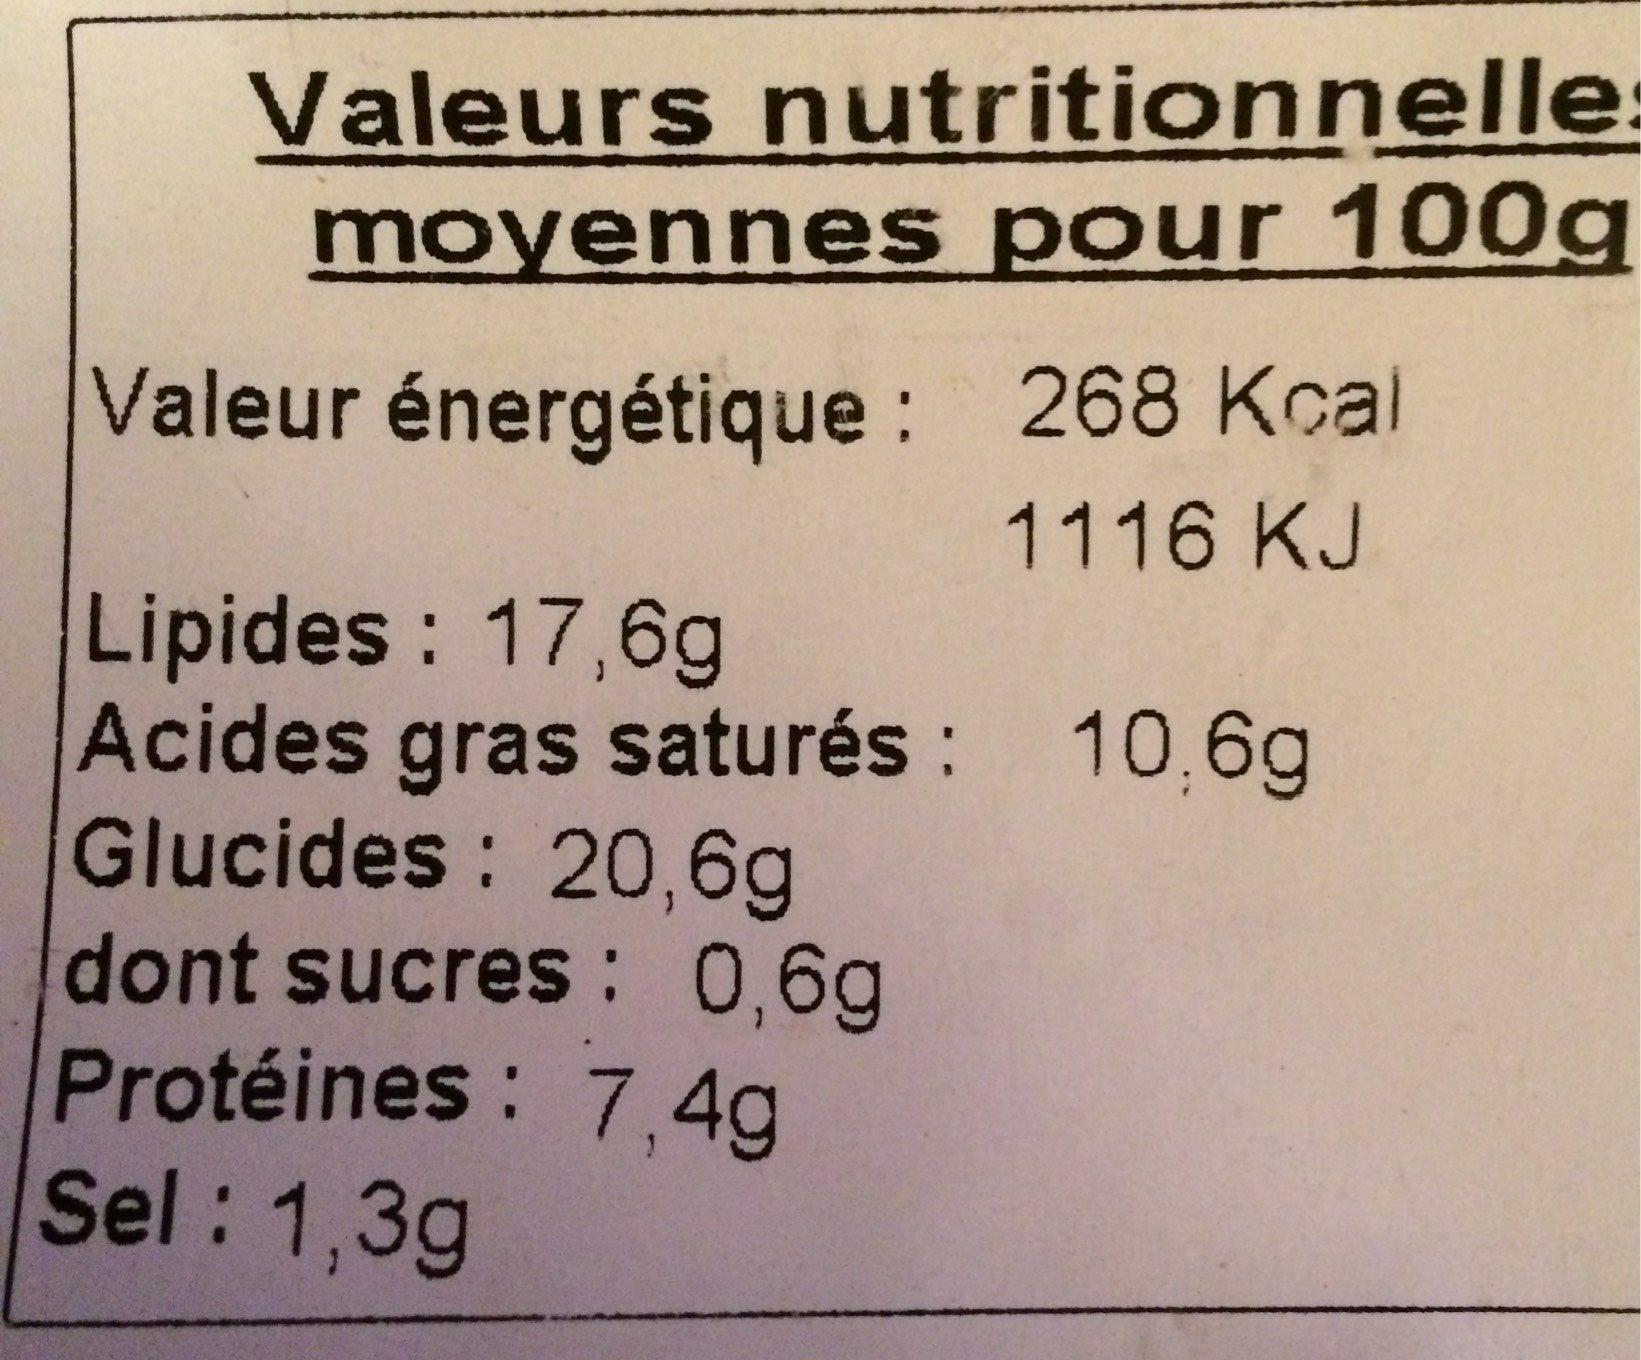 Feuilleté pommes de terre et viande - Voedingswaarden - fr